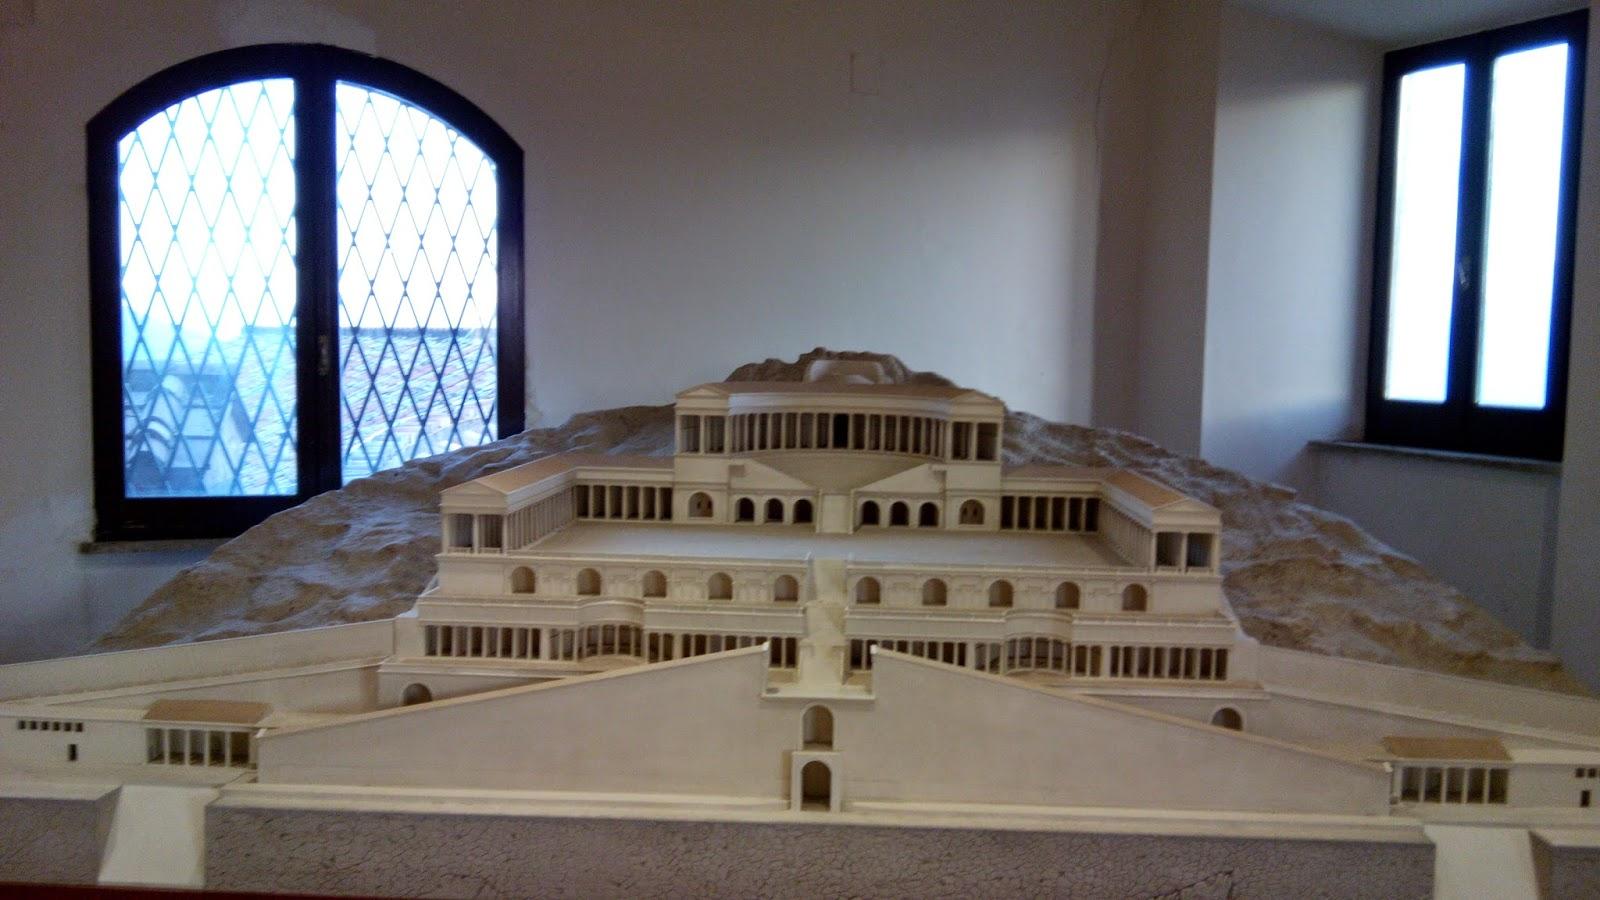 SANTUArio preneste maquete - Bate-e-volta à Palestrina